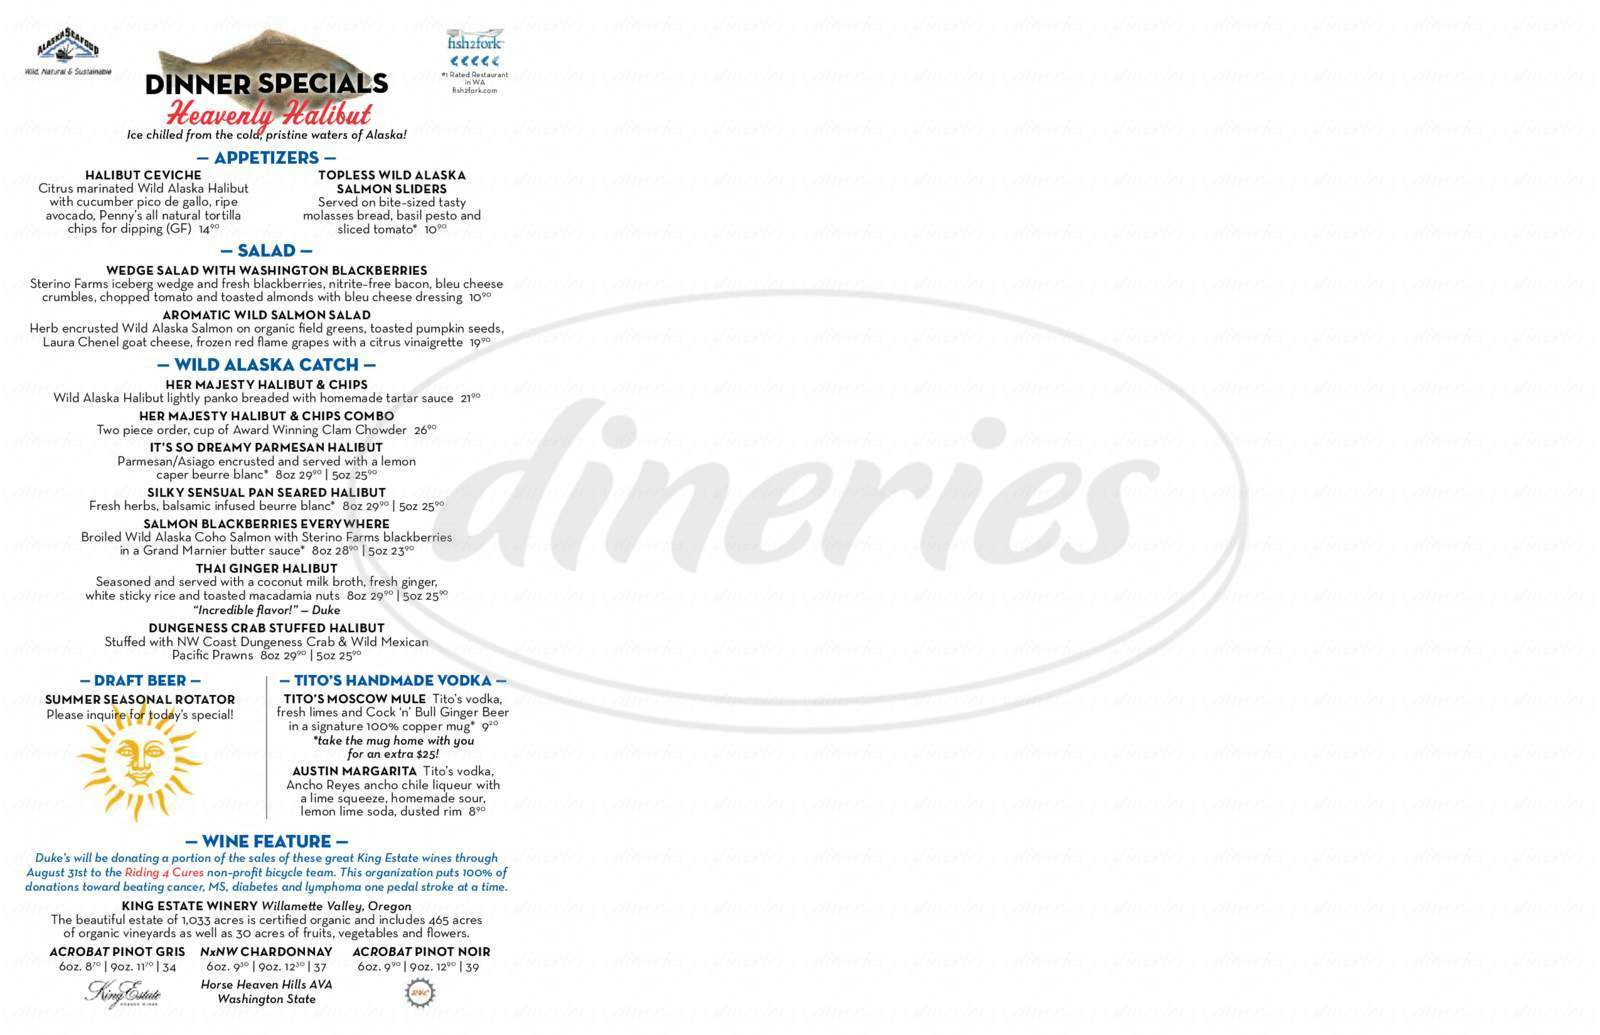 menu for Duke's Chowder House